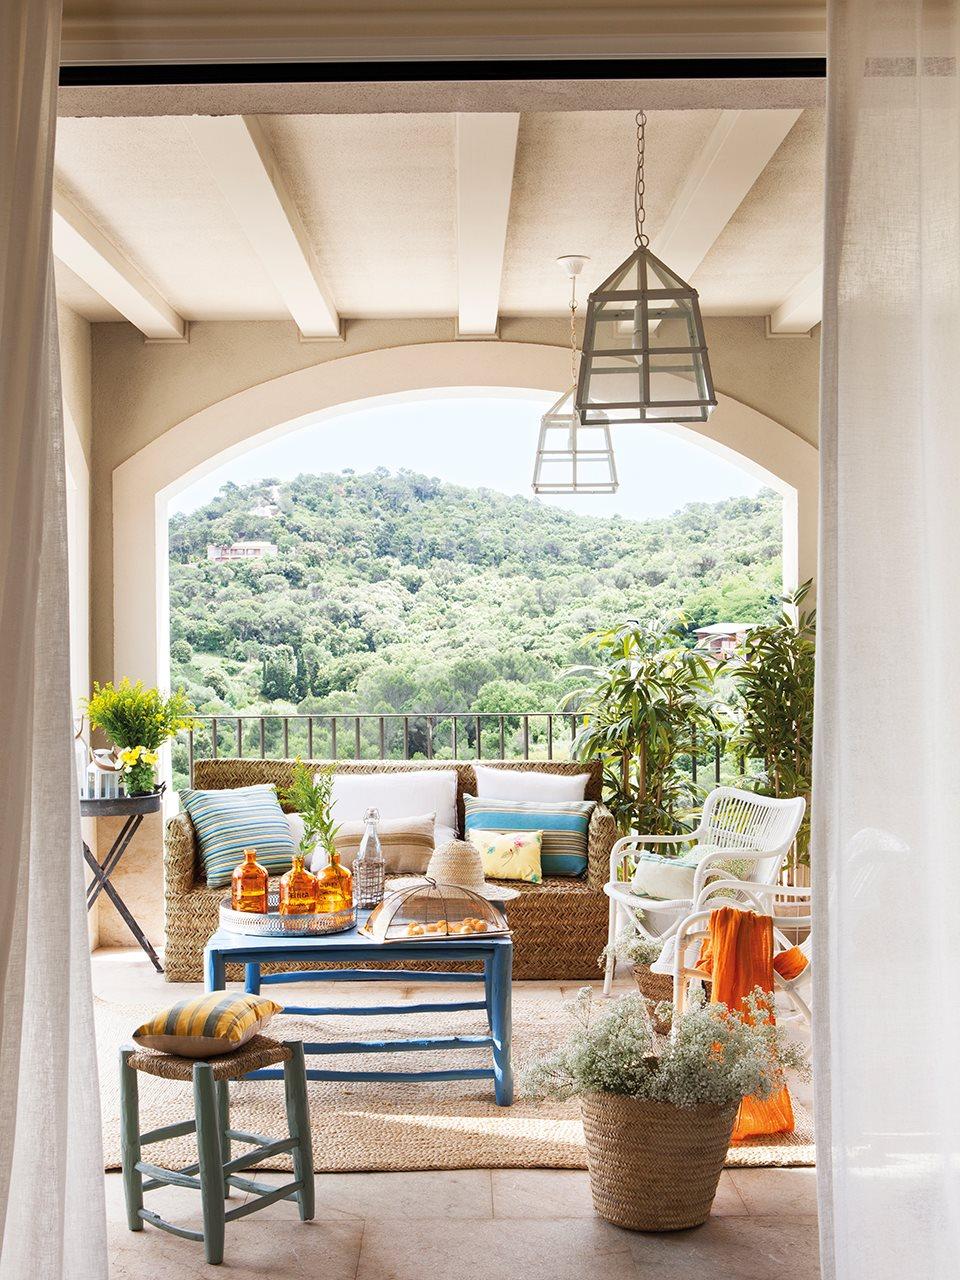 Tres porches tres estilos for Muebles para porches